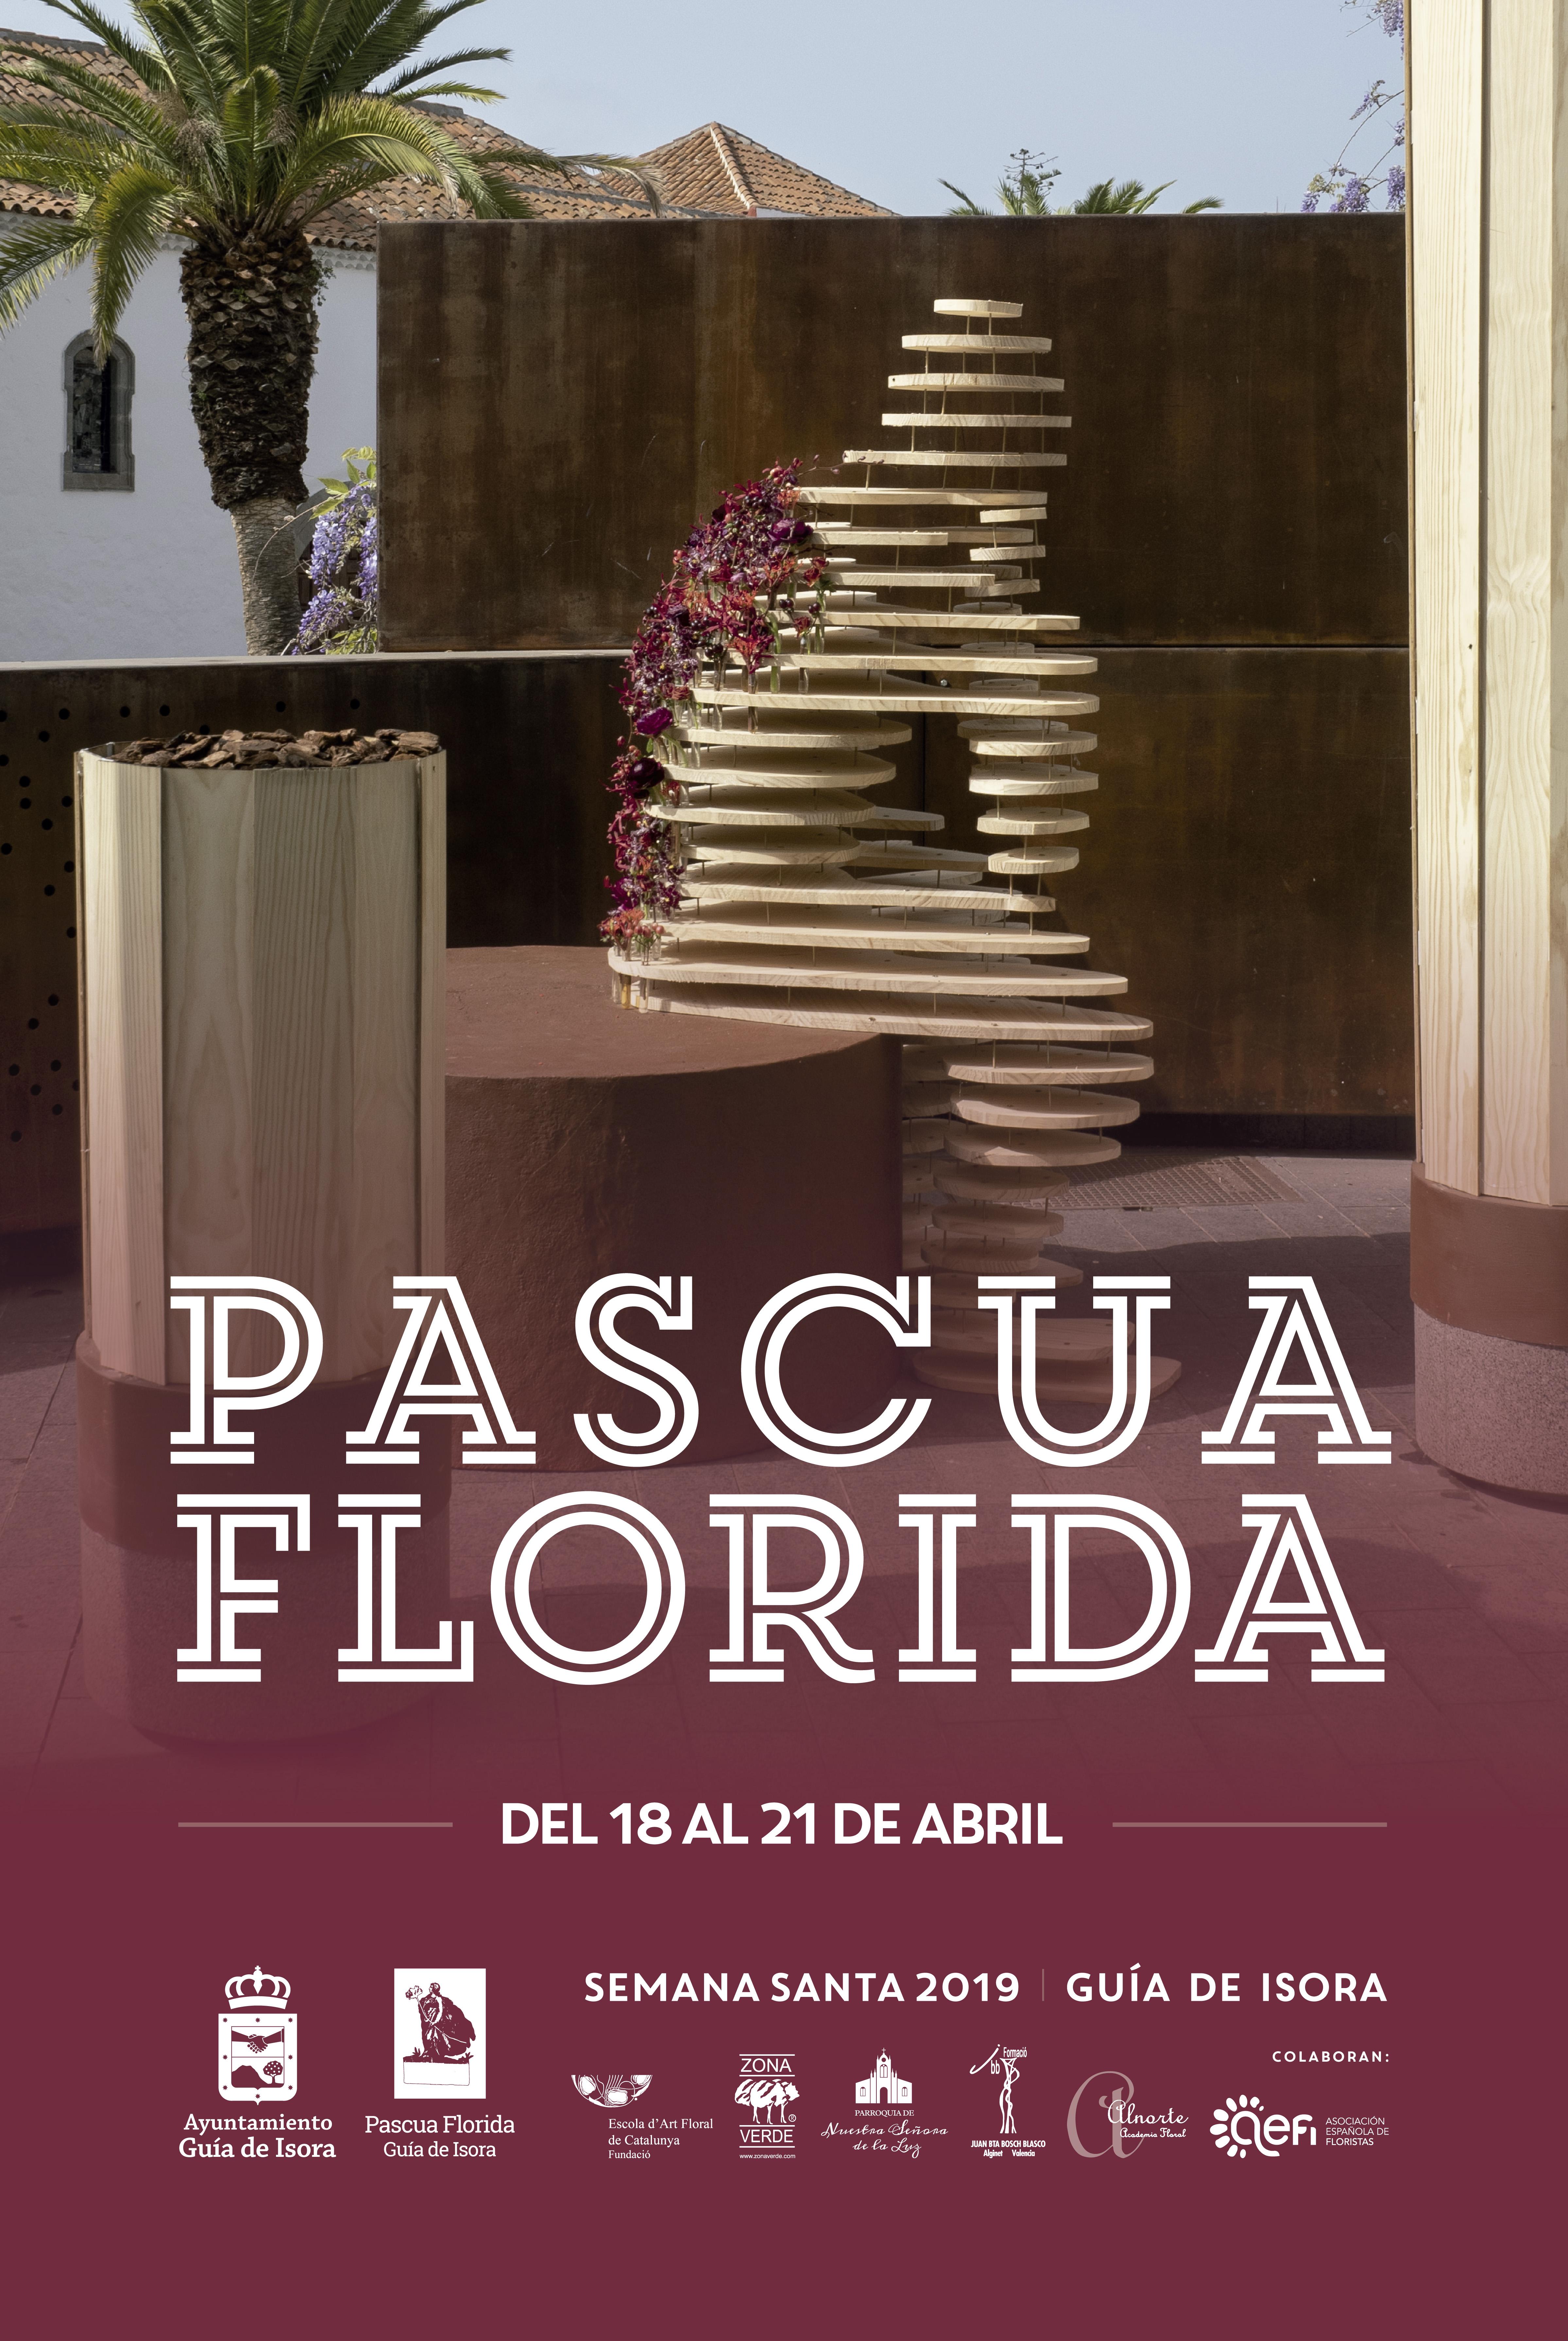 cartel_pascua_florida_GDI19_40x60cms_impress_cmyk